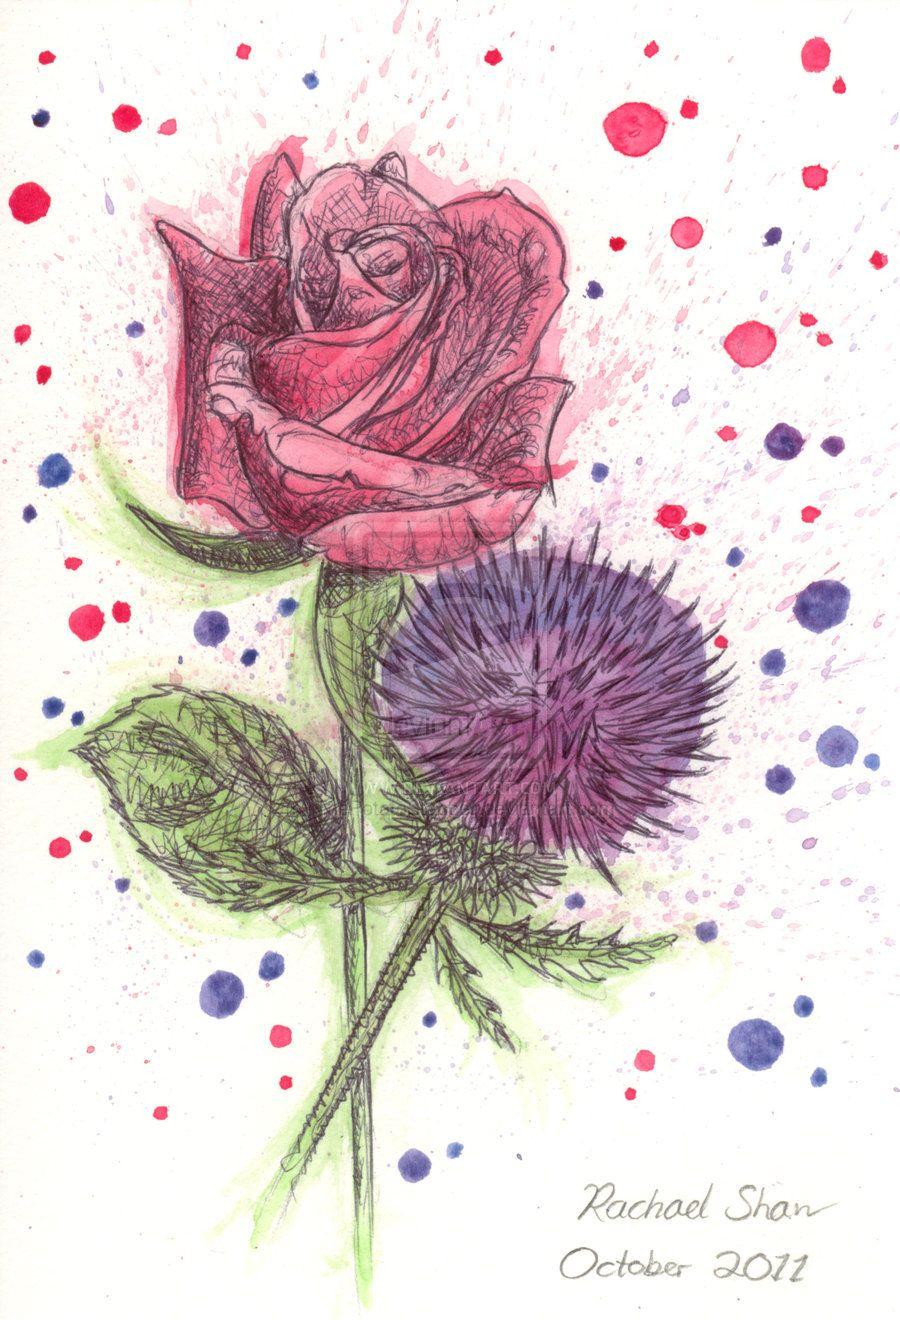 Http Thepotatostabber Deviantart Com Art A Rose And Thistle 265384024 Thistle Tattoo Thistle Red Roses